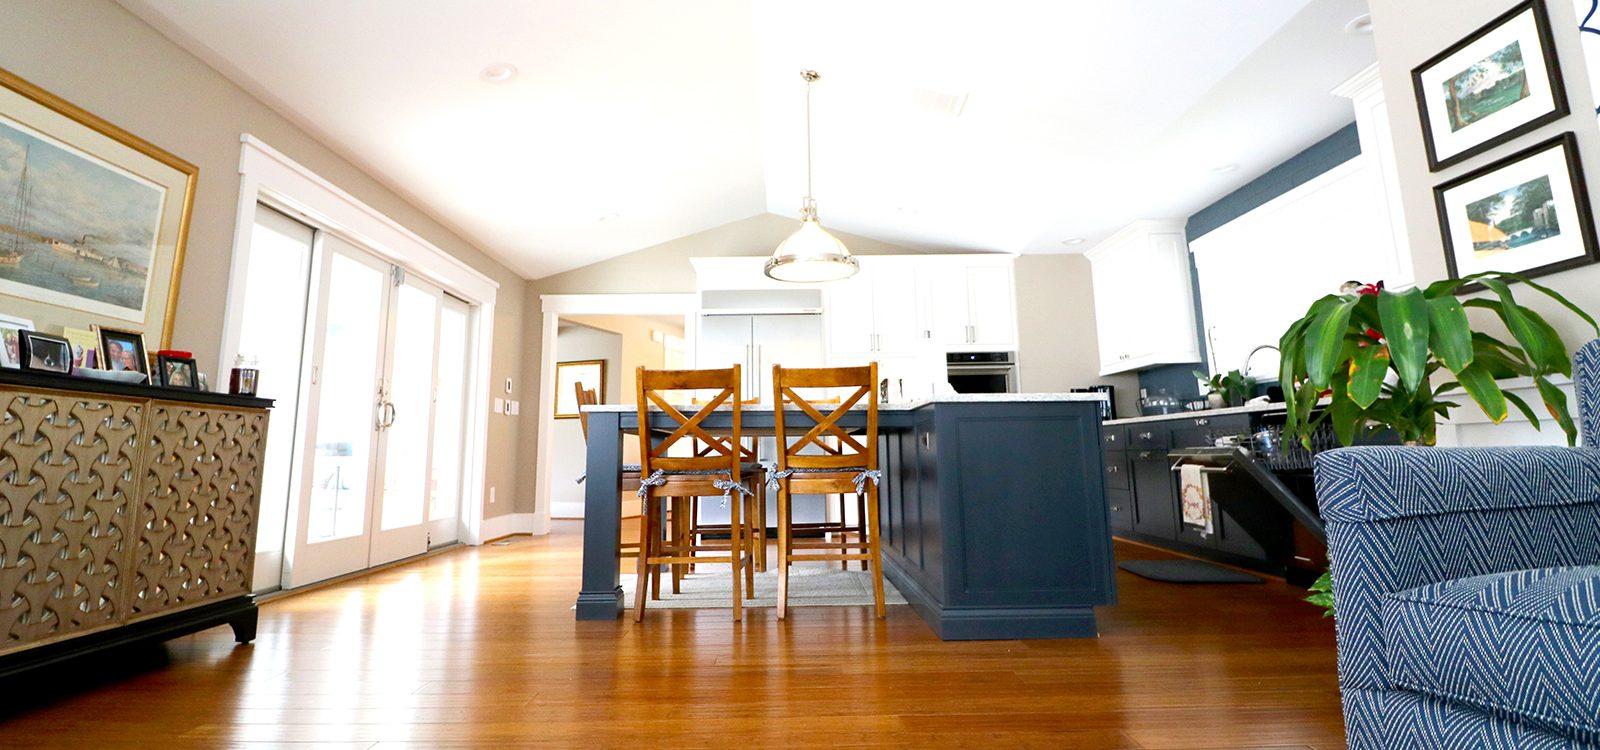 home-renovation-in-fredericksburg-6.jpg